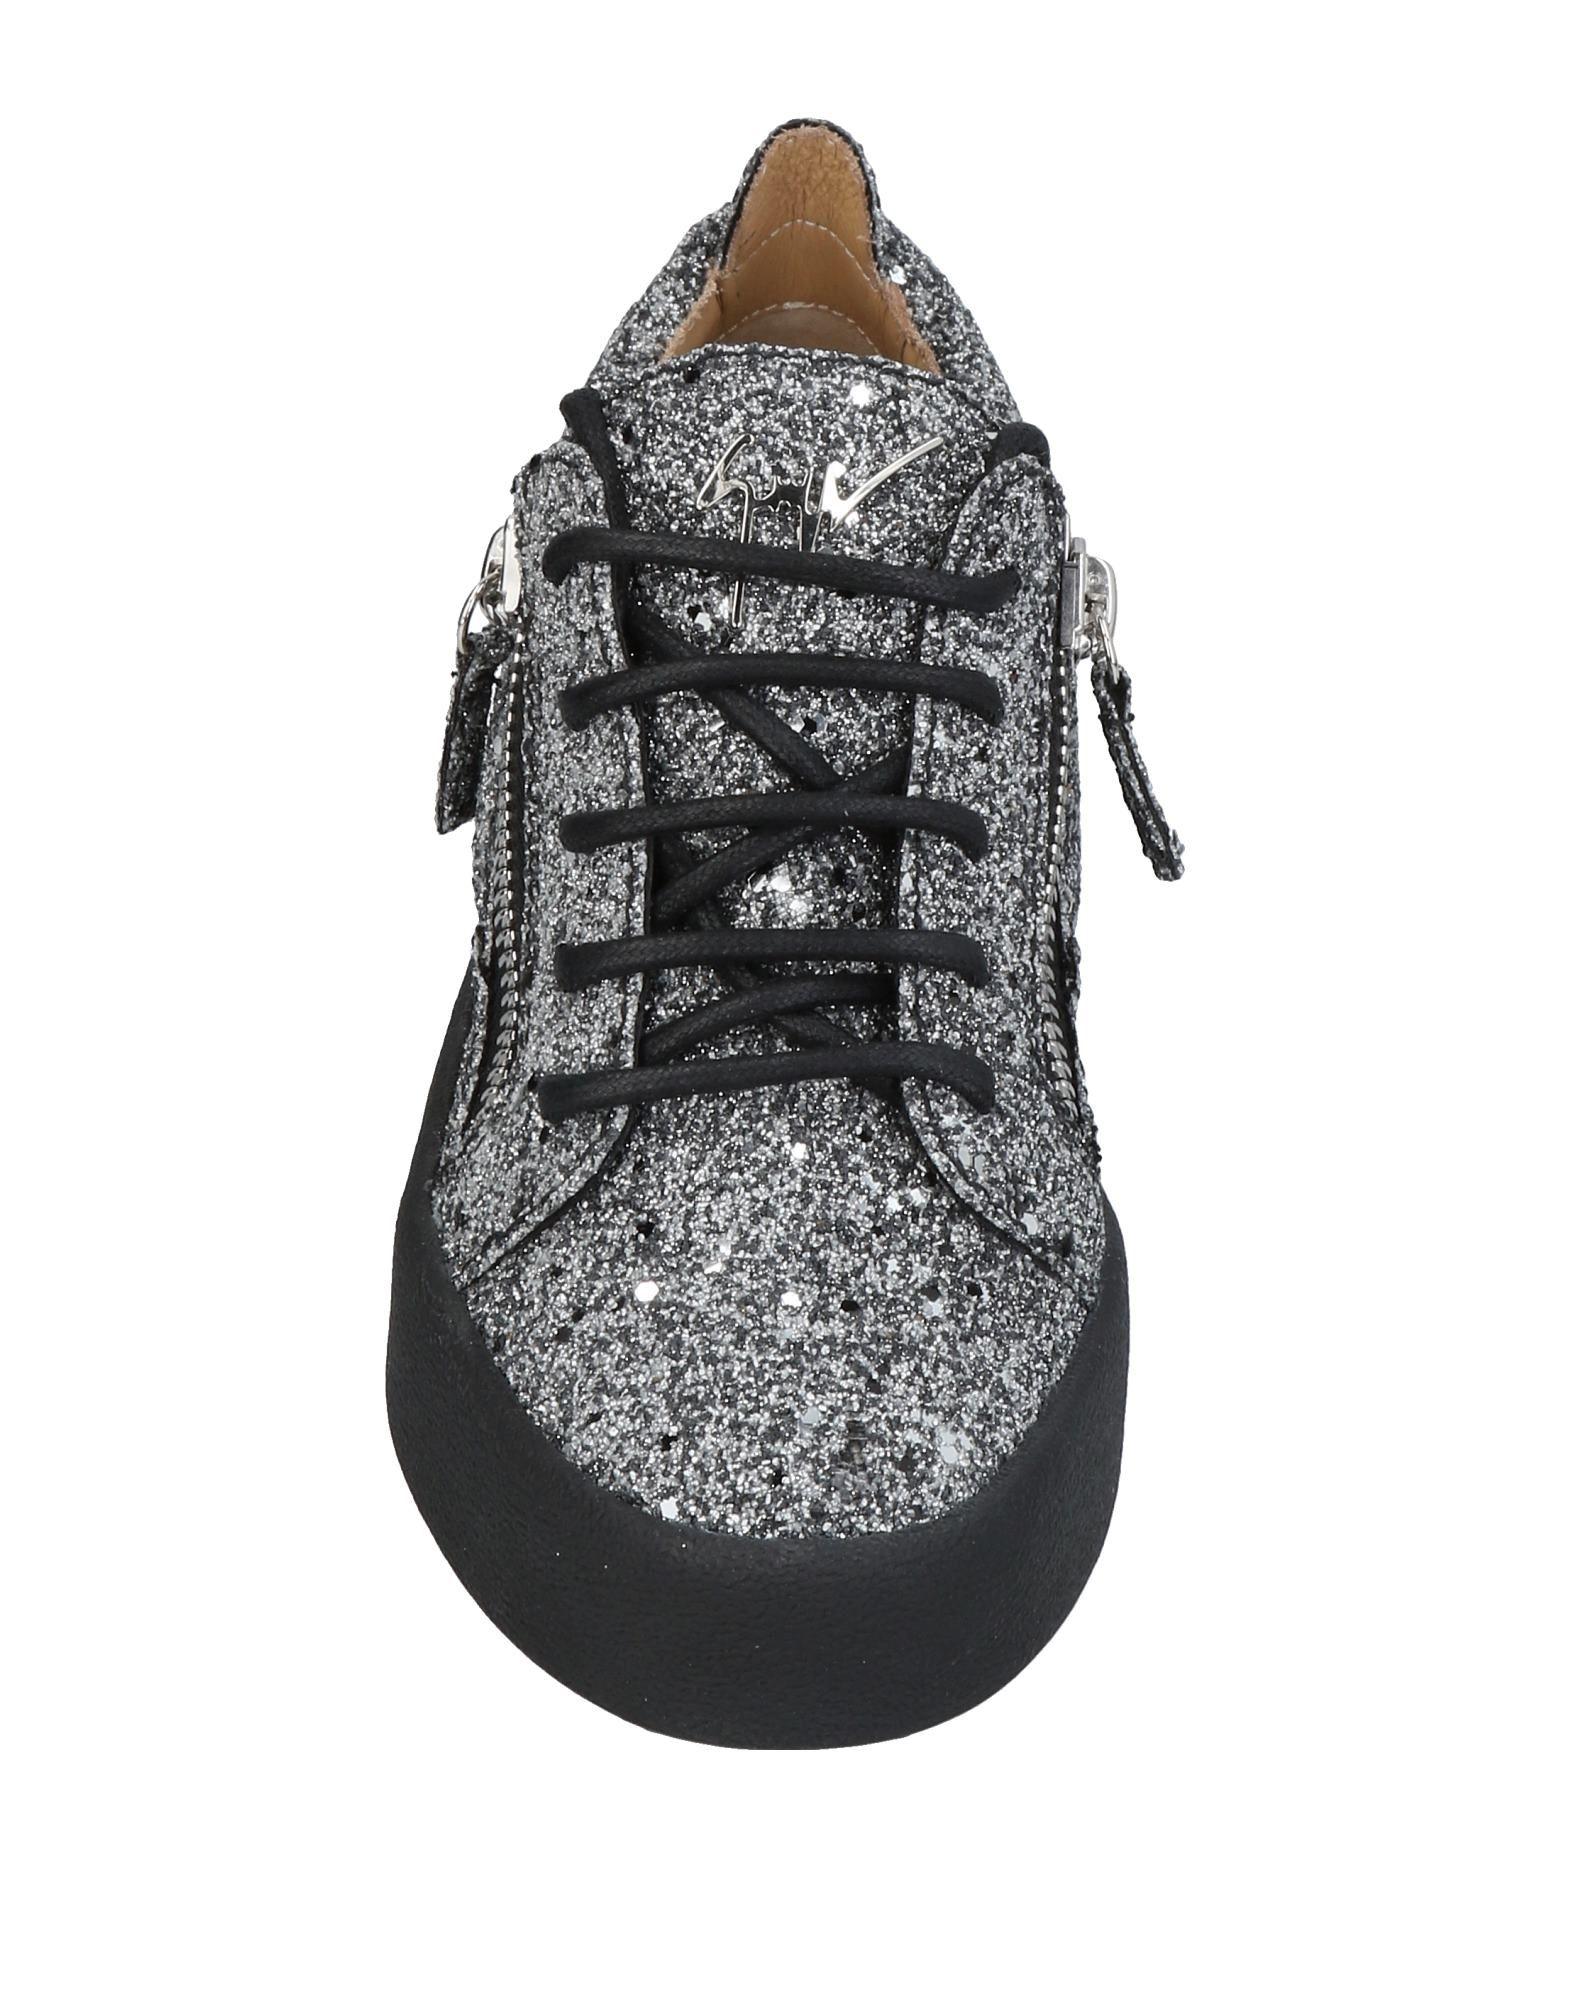 Giuseppe Zanotti Sneakers Damen Schuhe  11446474OXGünstige gut aussehende Schuhe Damen 117611